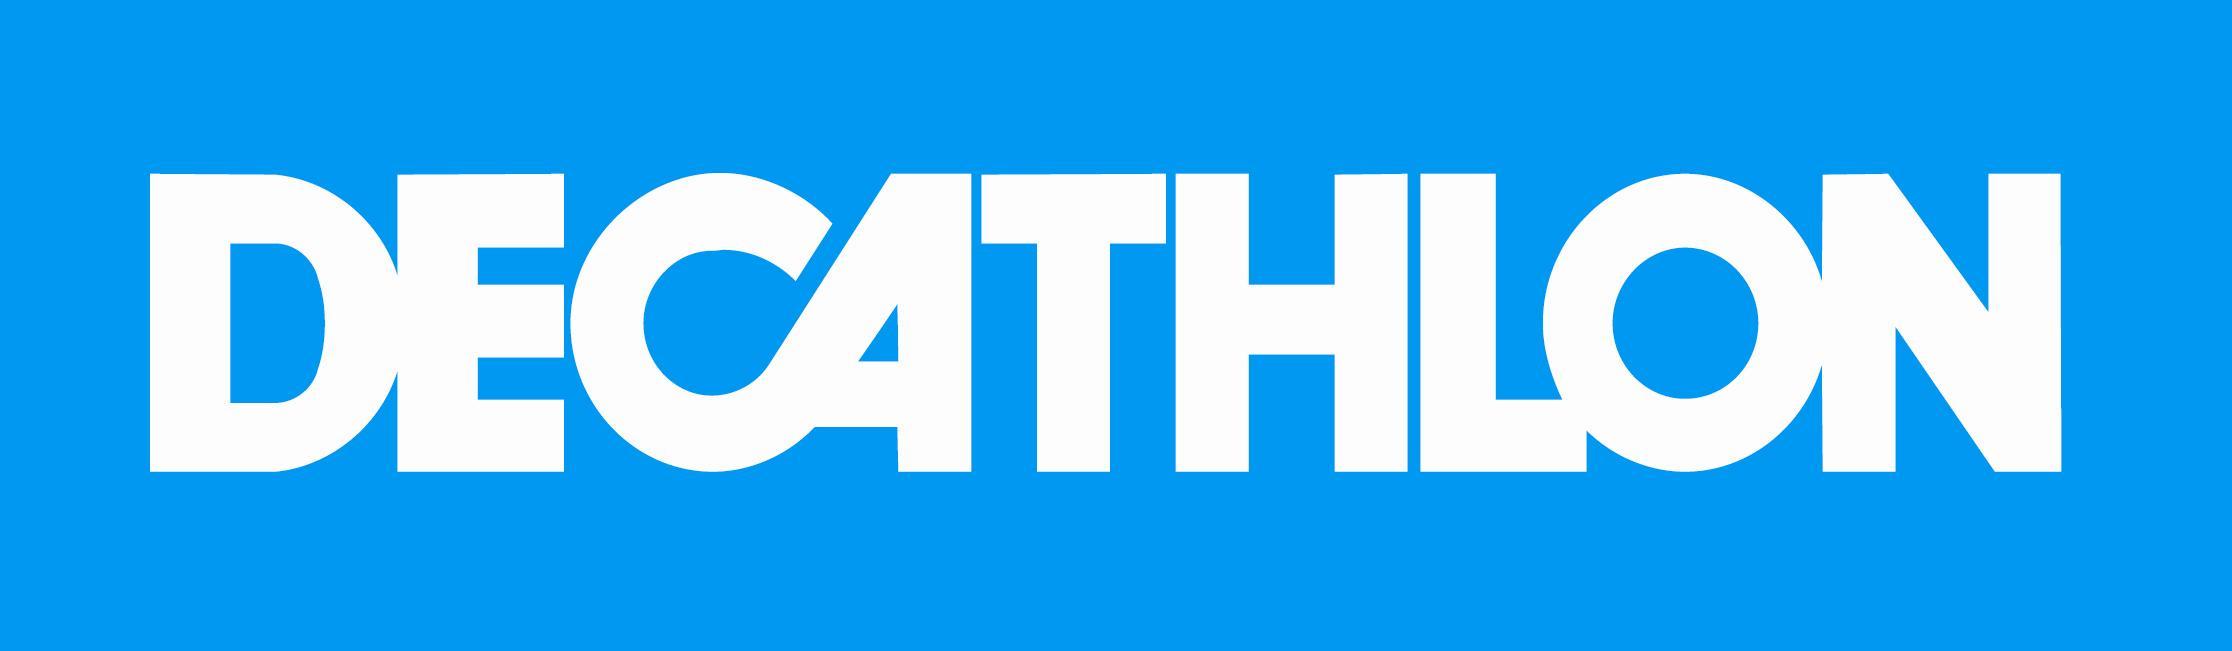 Pantalon ESSENTIALS Logo  Decathlon